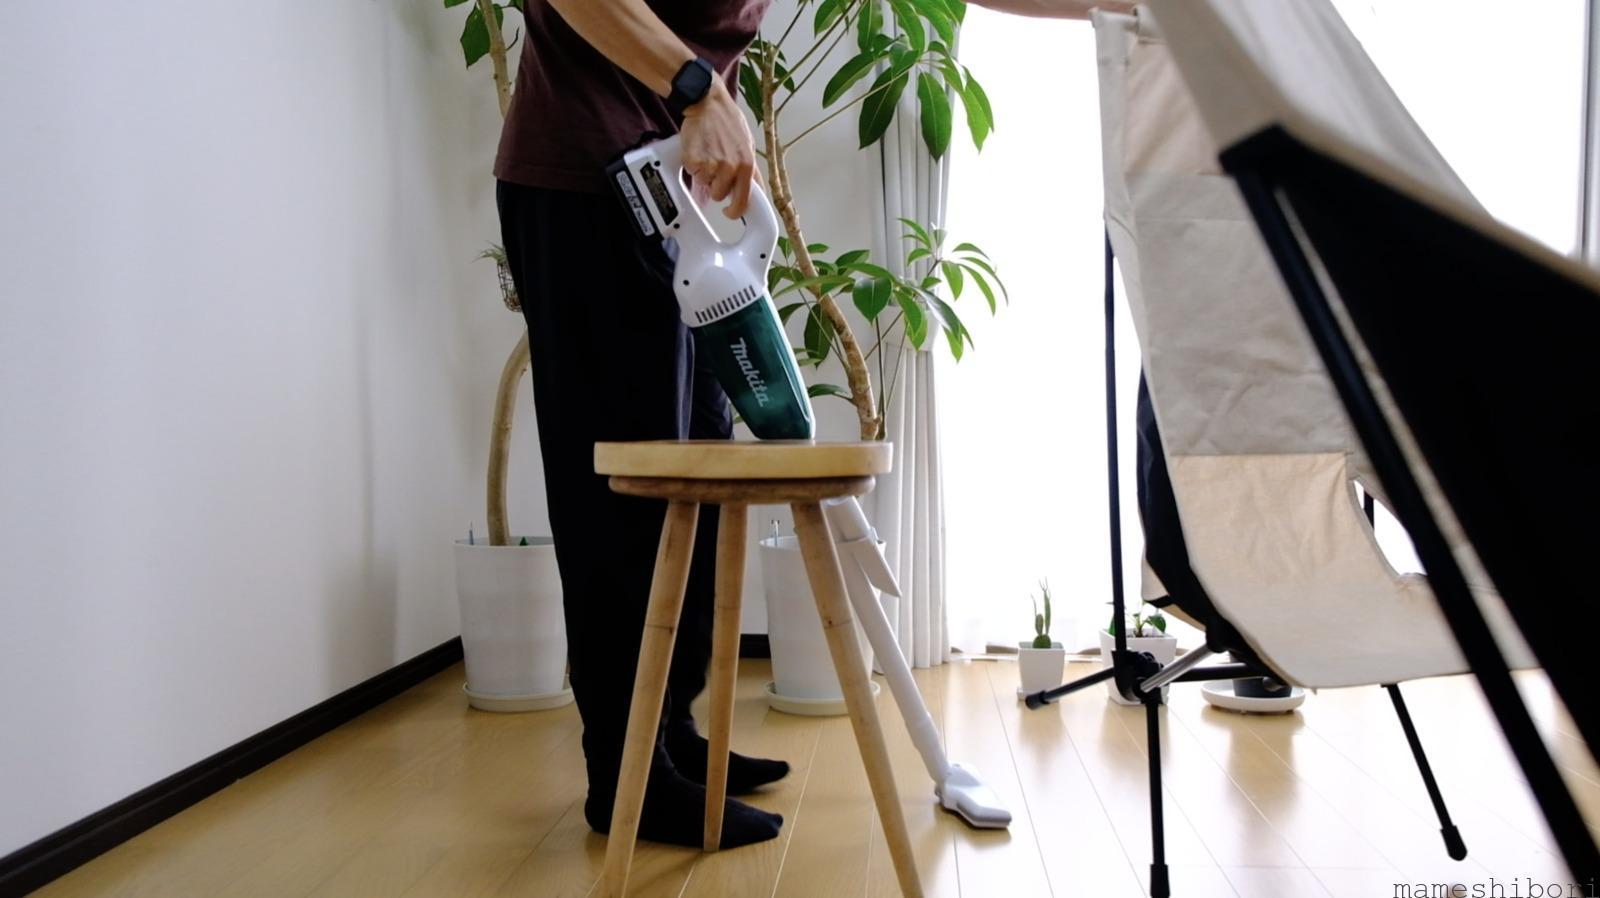 Helinox-chairtwohome-vacuumcleaner